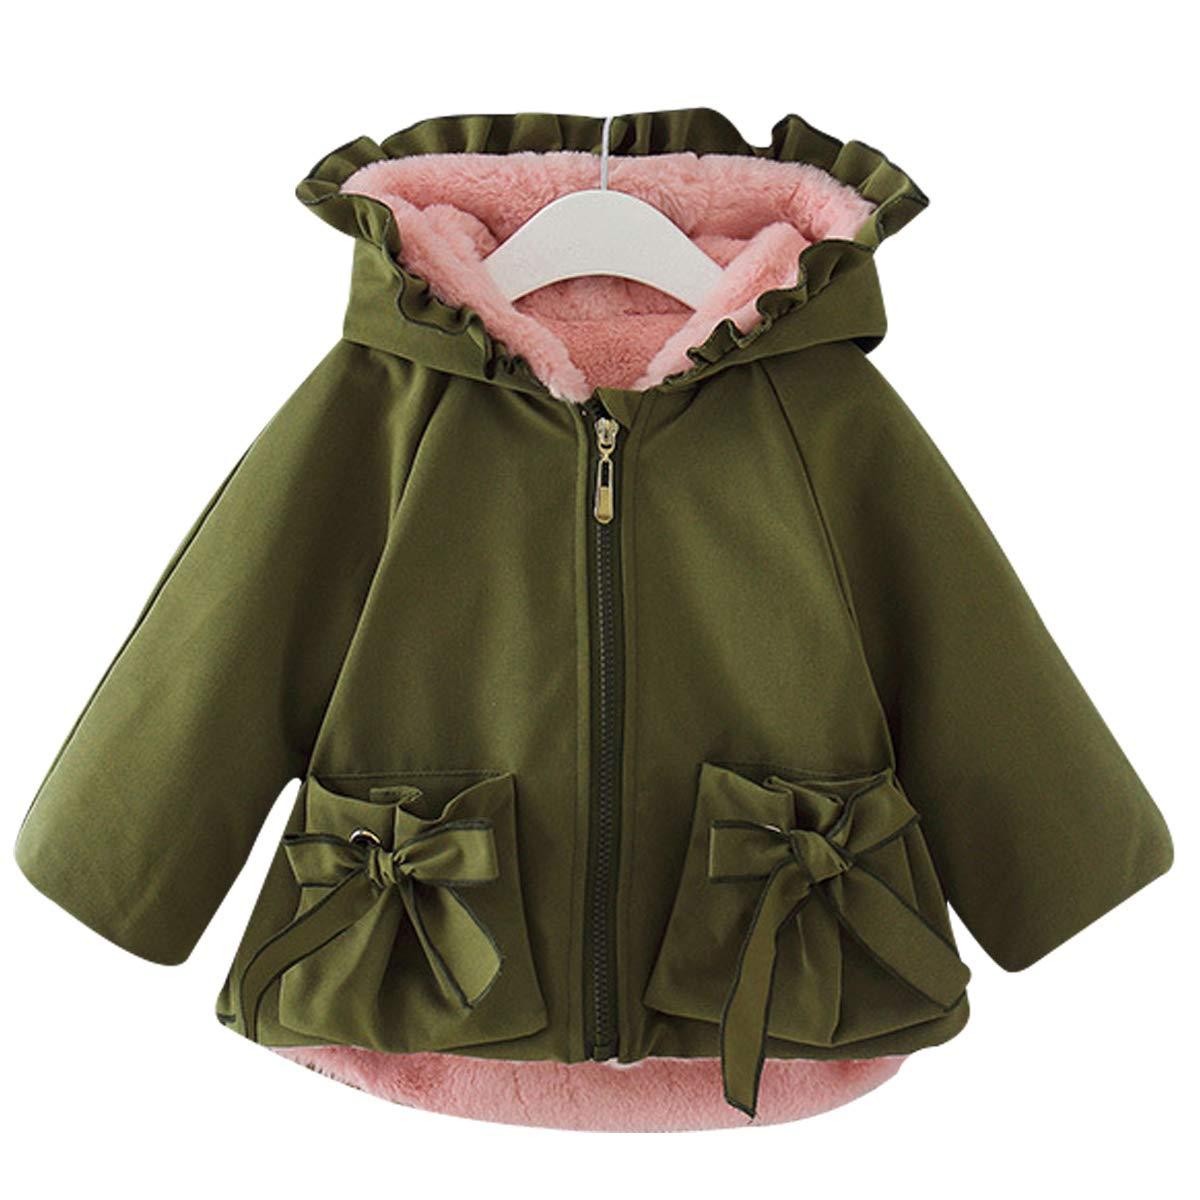 Famuka Winter Baby Girl Jackets Thick Fleece Lined Winter Coat Cute Ruffled Outwear (Green, 6-12 Months) by Famuka